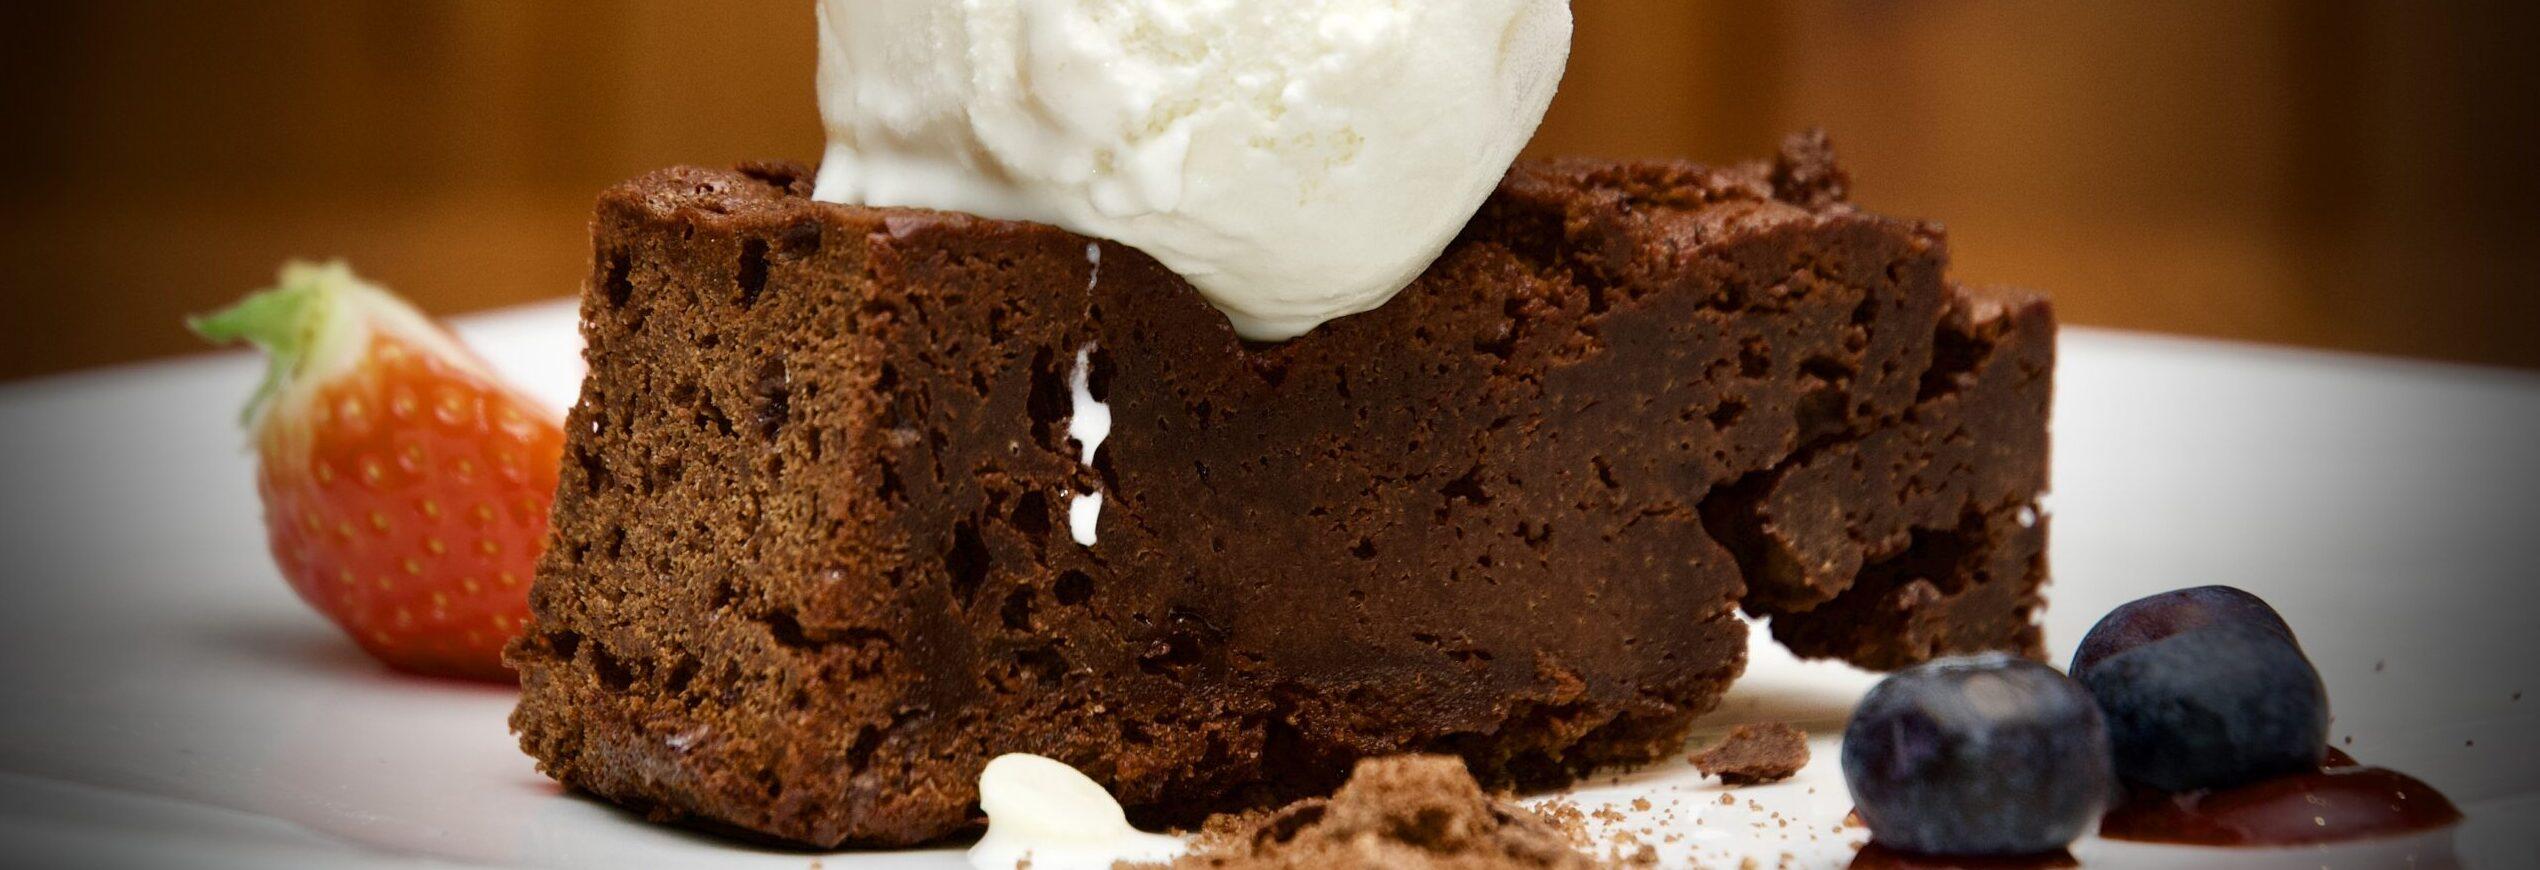 Chocolate Brownie...